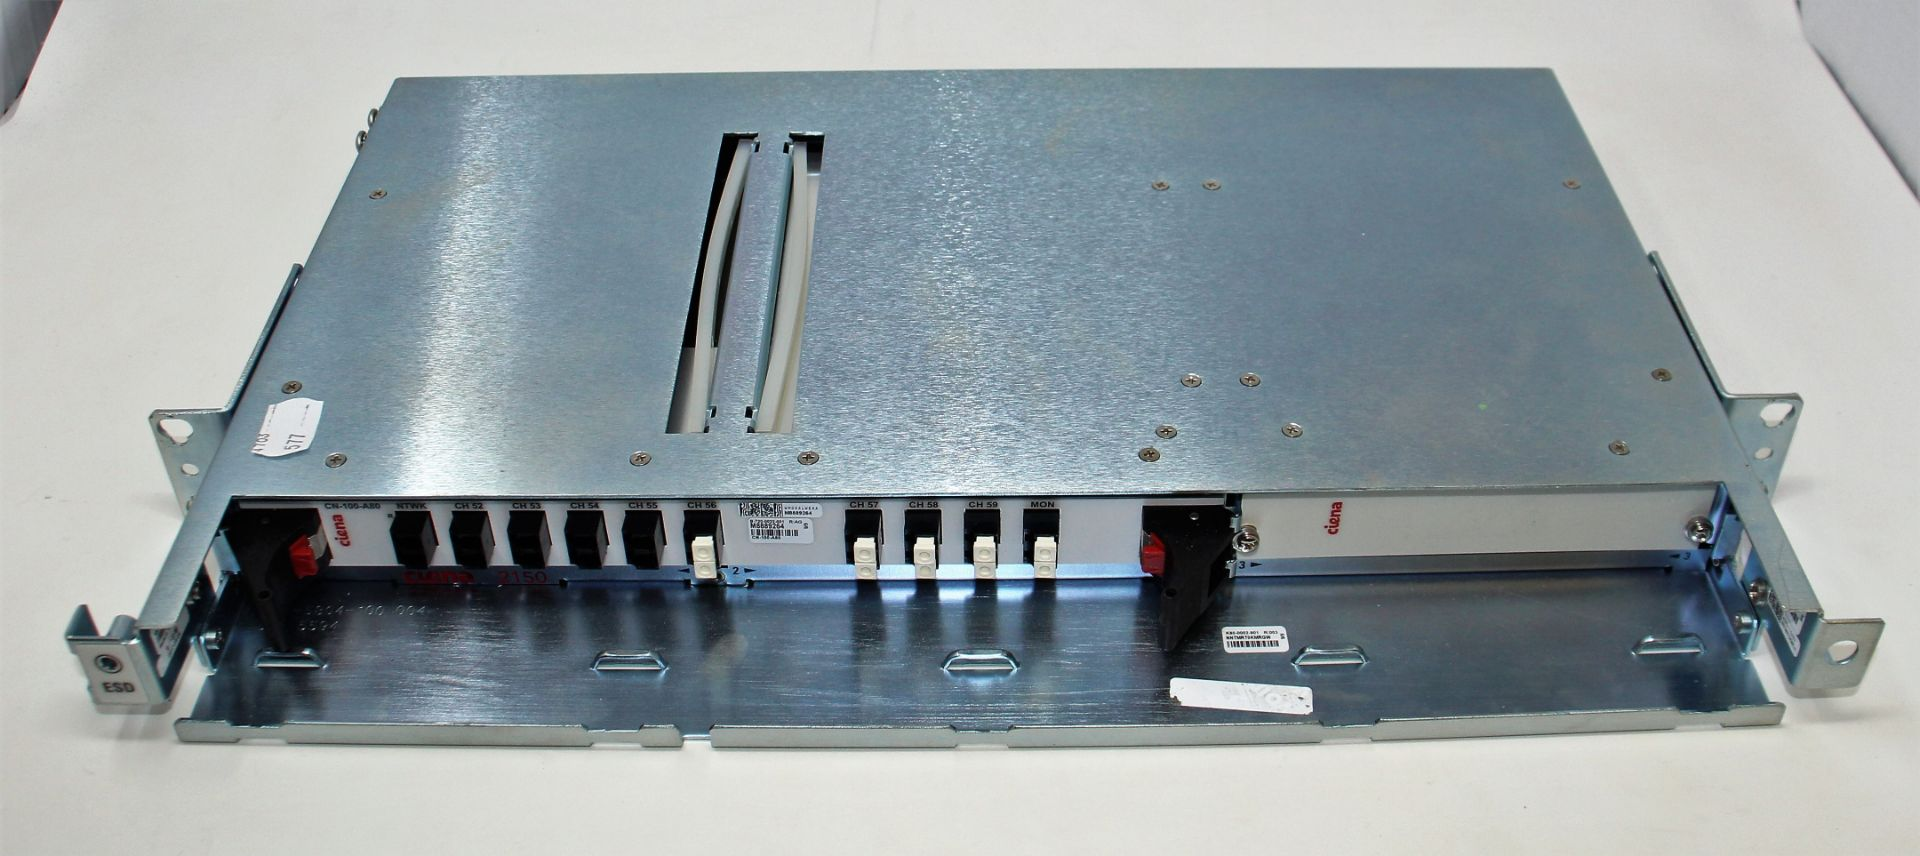 A pre-owned Ciena CN-100-A80 B-720-0022-001 WM0AALWEAA M8889224 DWDM Module (Untested, sold as